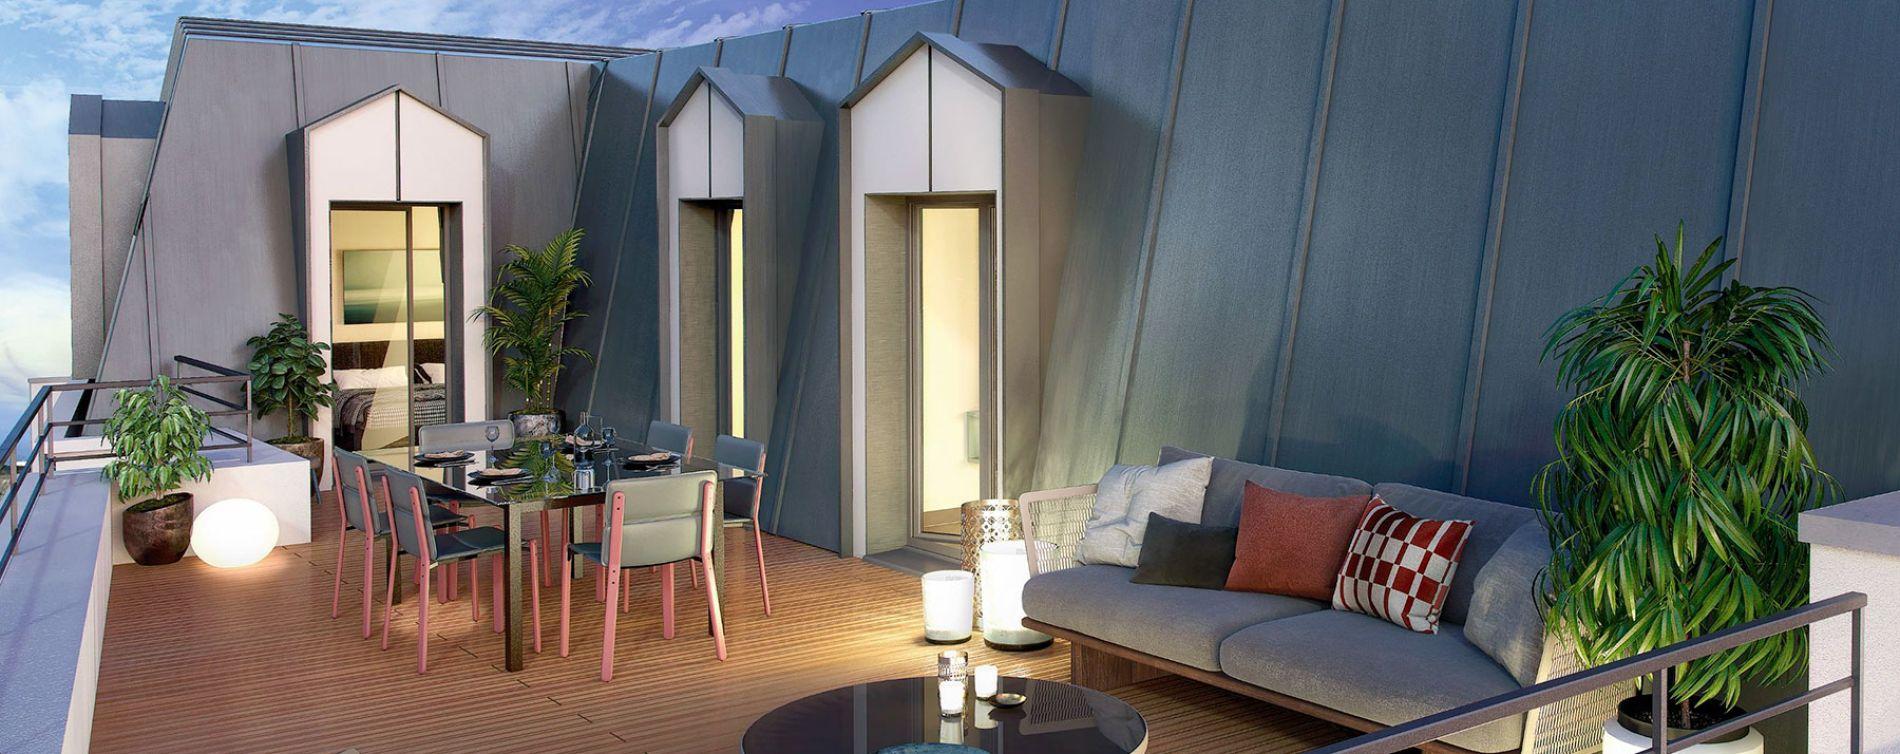 Savigny-sur-Orge : programme immobilier neuve « Le Savini » (2)